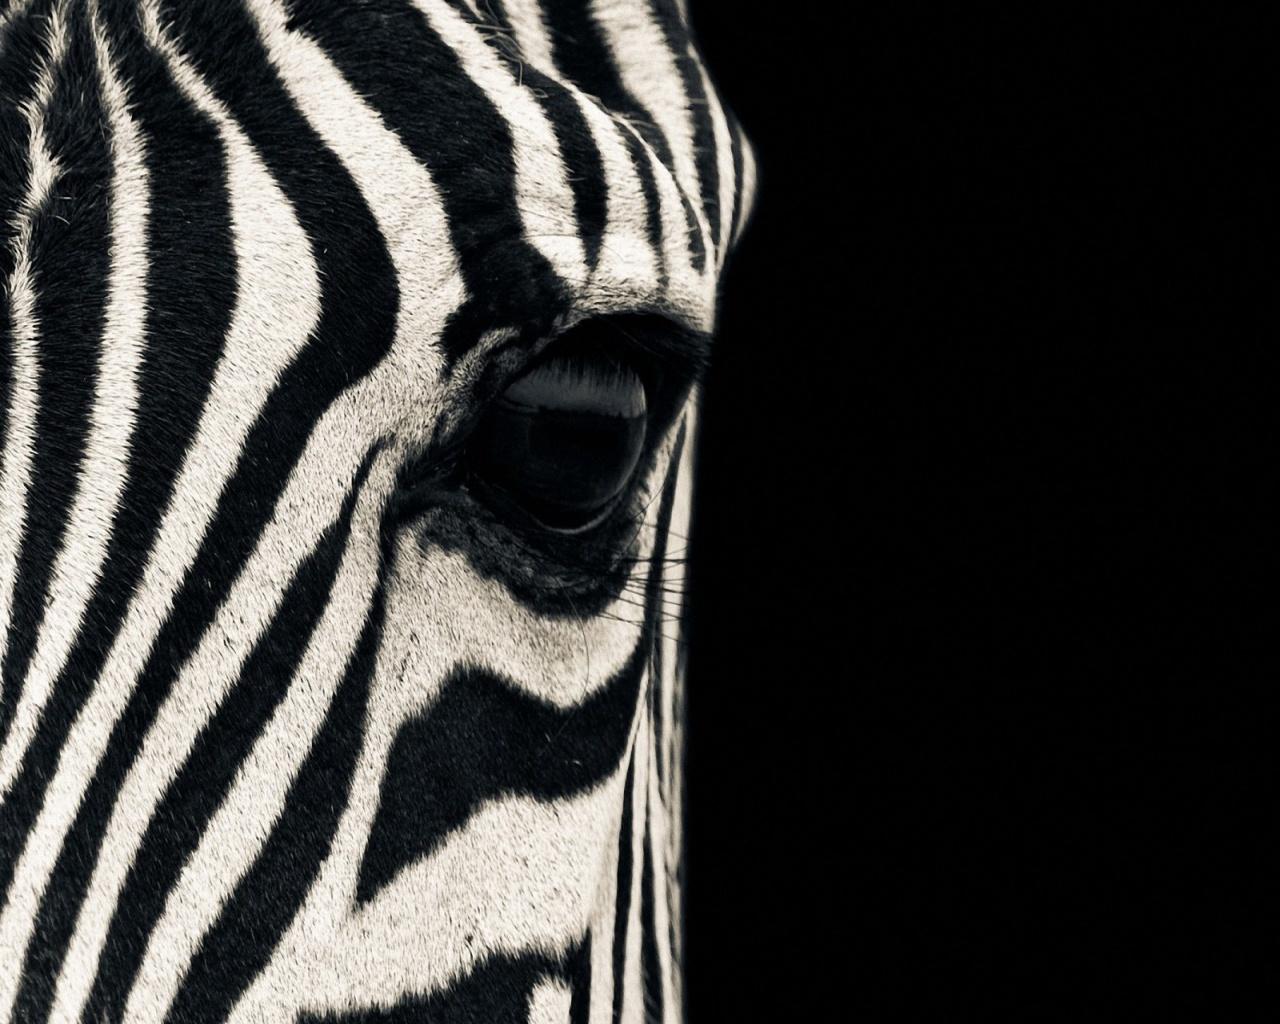 Download Zebra Print Wallpaper Full HD Wallpapers 1280x1024